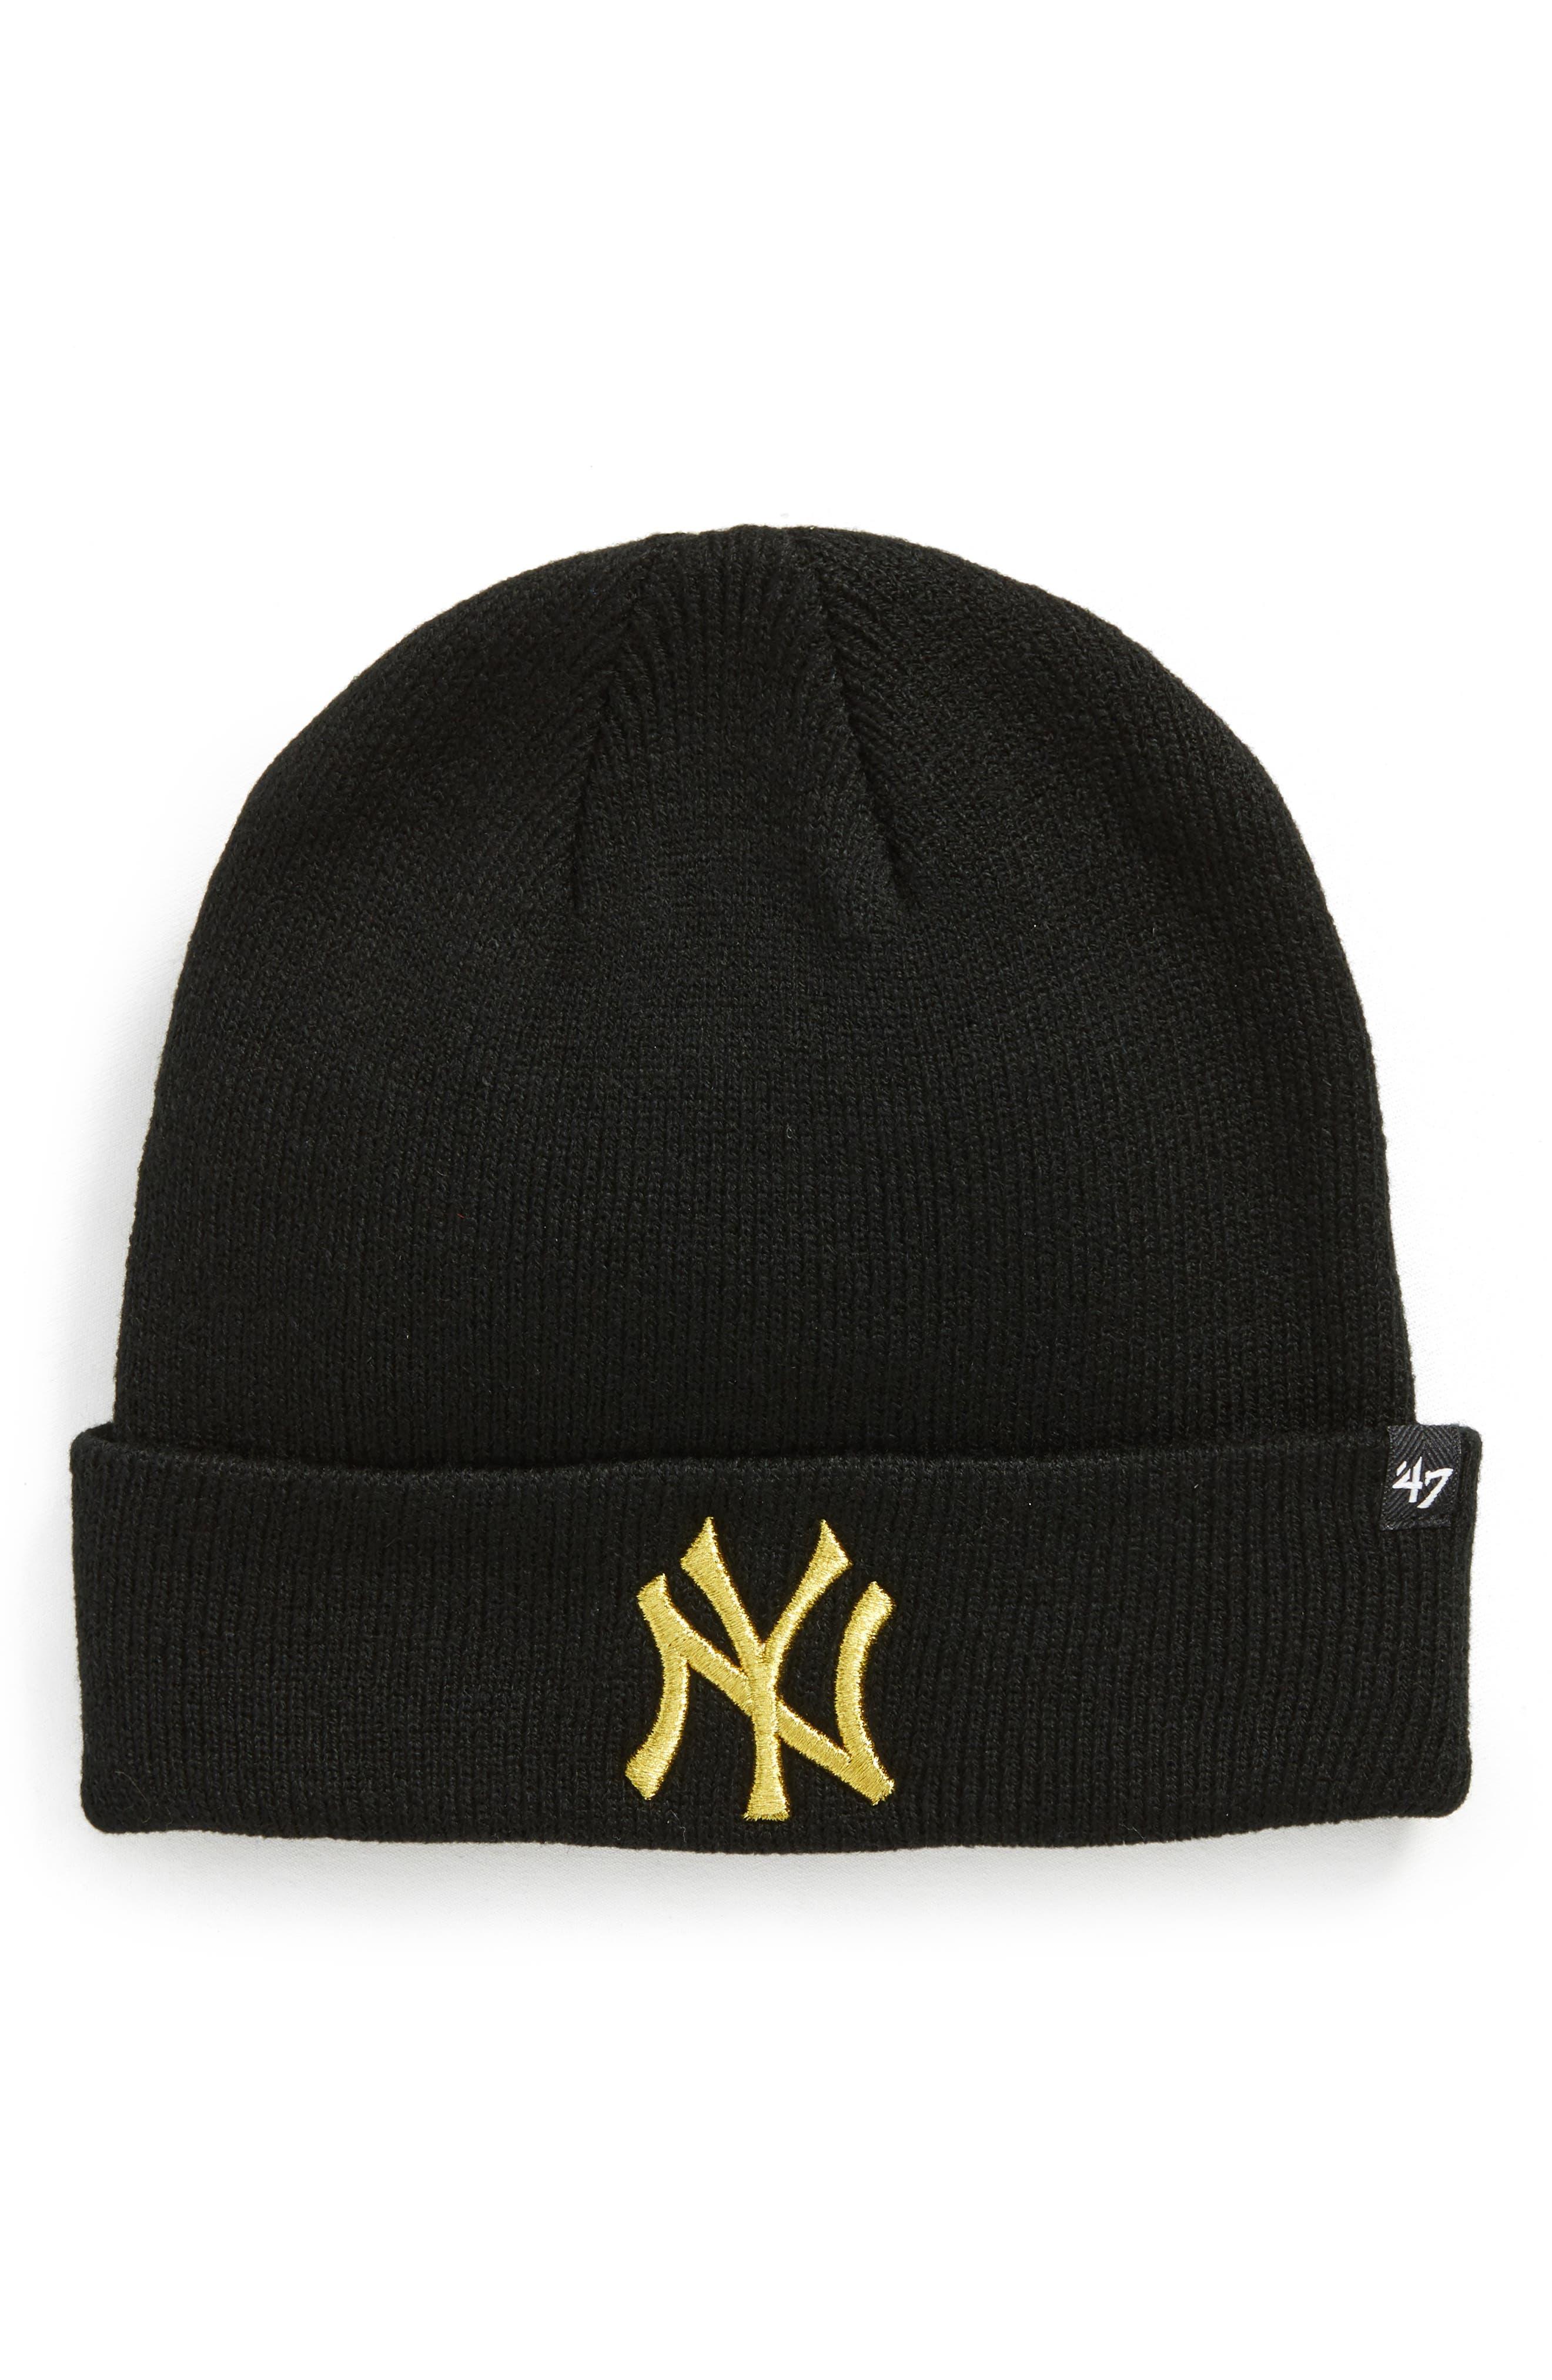 New York Yankees Metallic Beanie,                         Main,                         color, 001